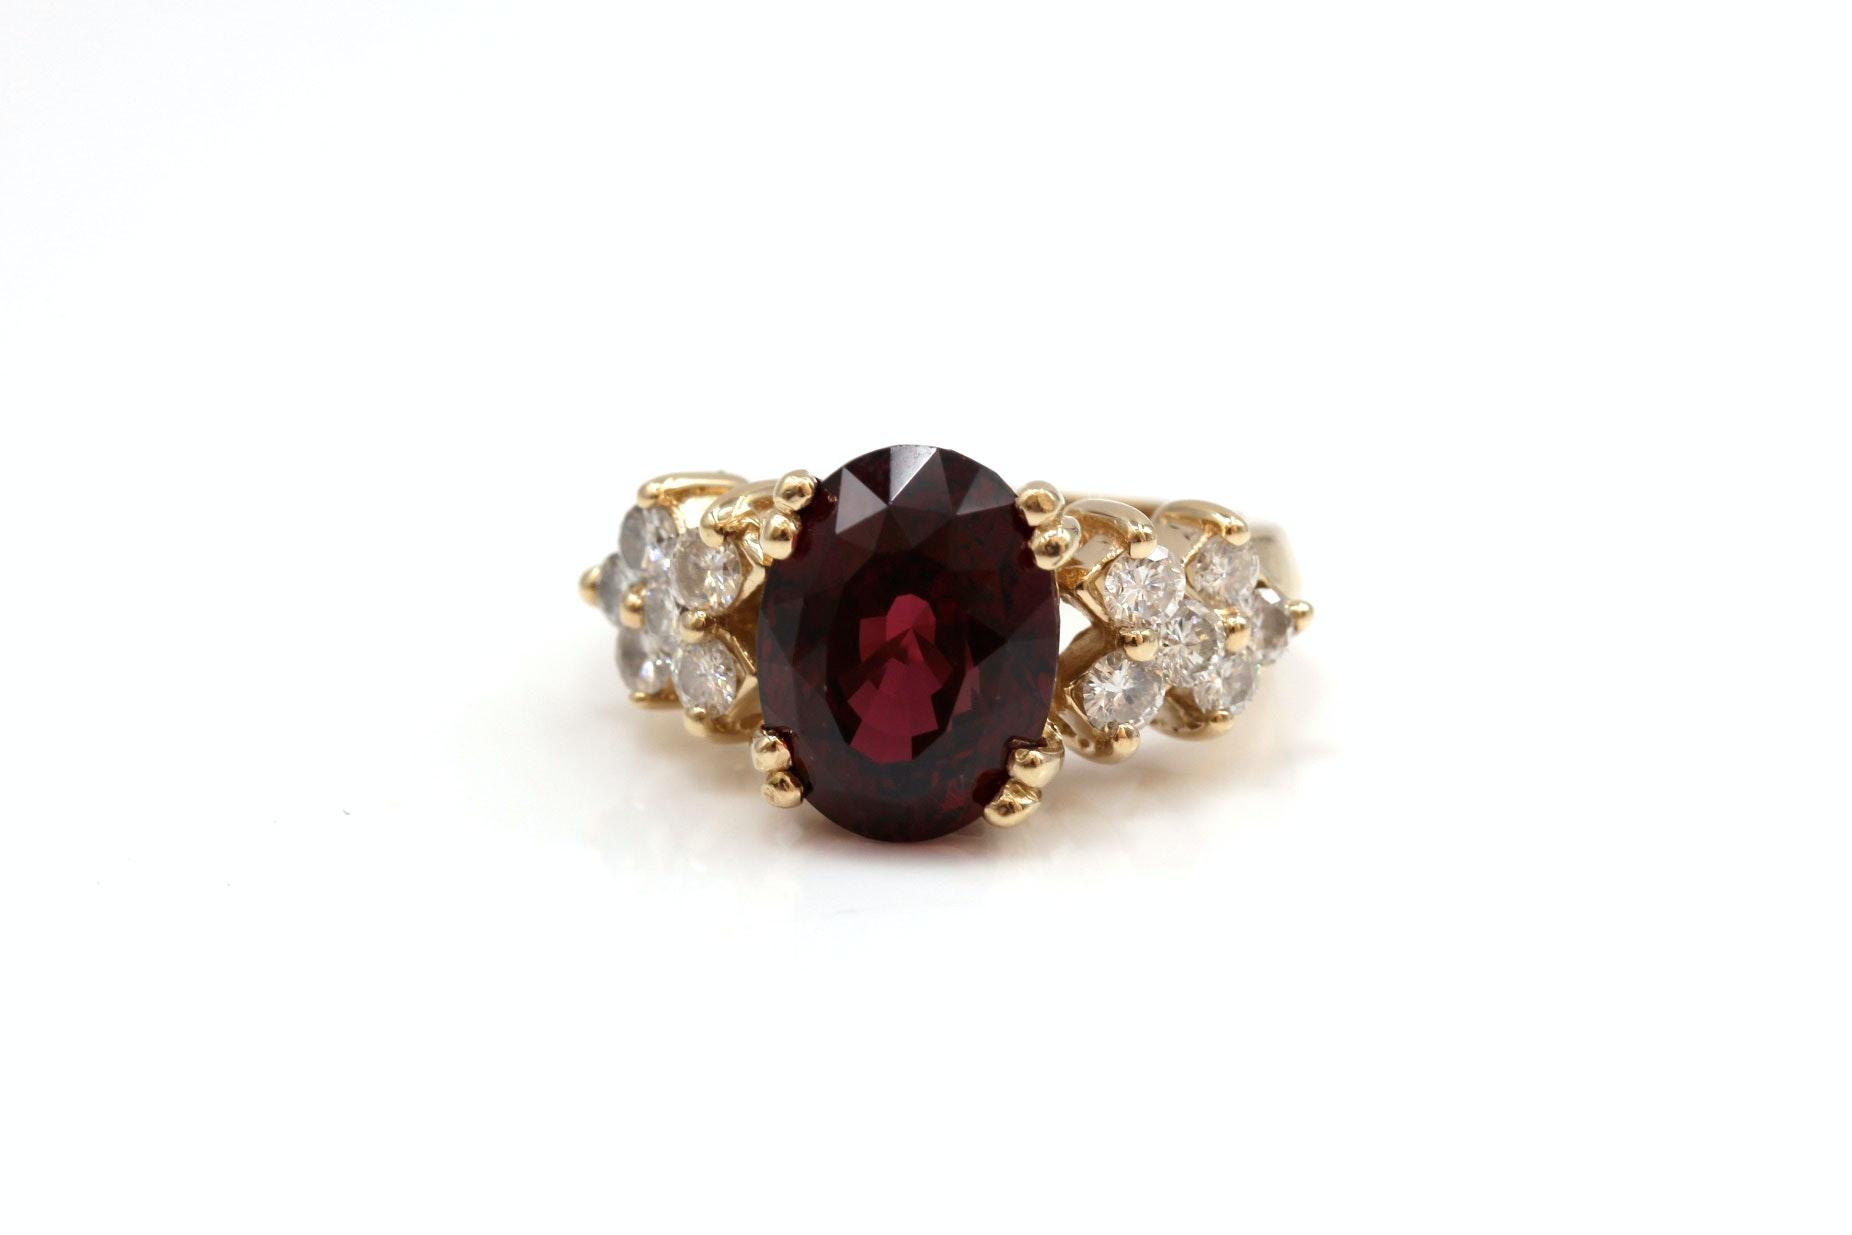 14K Yellow Gold 6.75 CTS Garnet and Diamond Ring